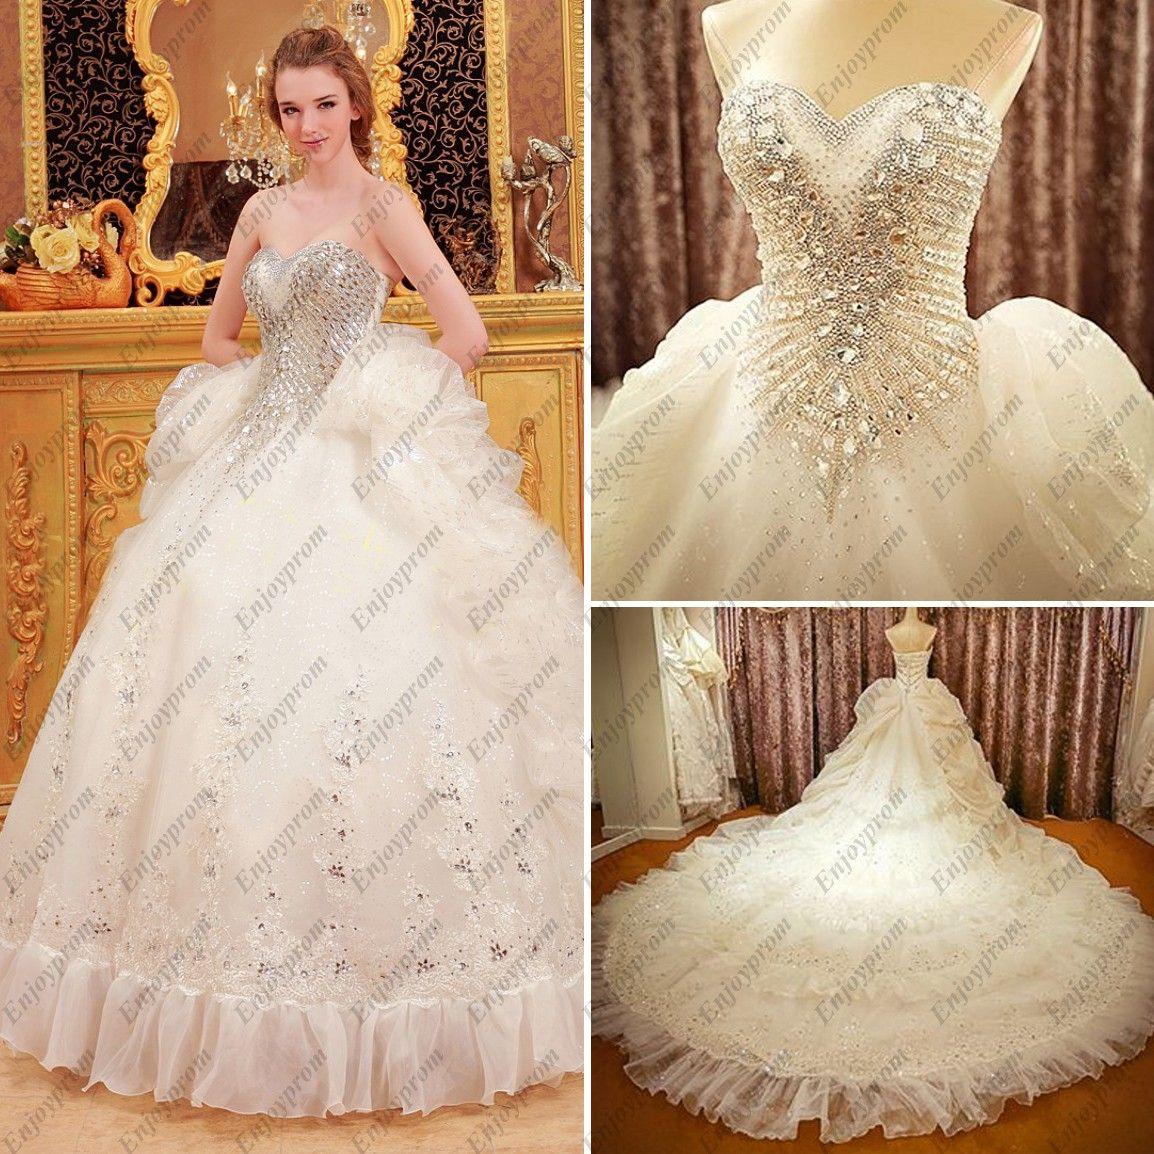 wedding dresses wedding gown Hot Ball Gown wedding dresses